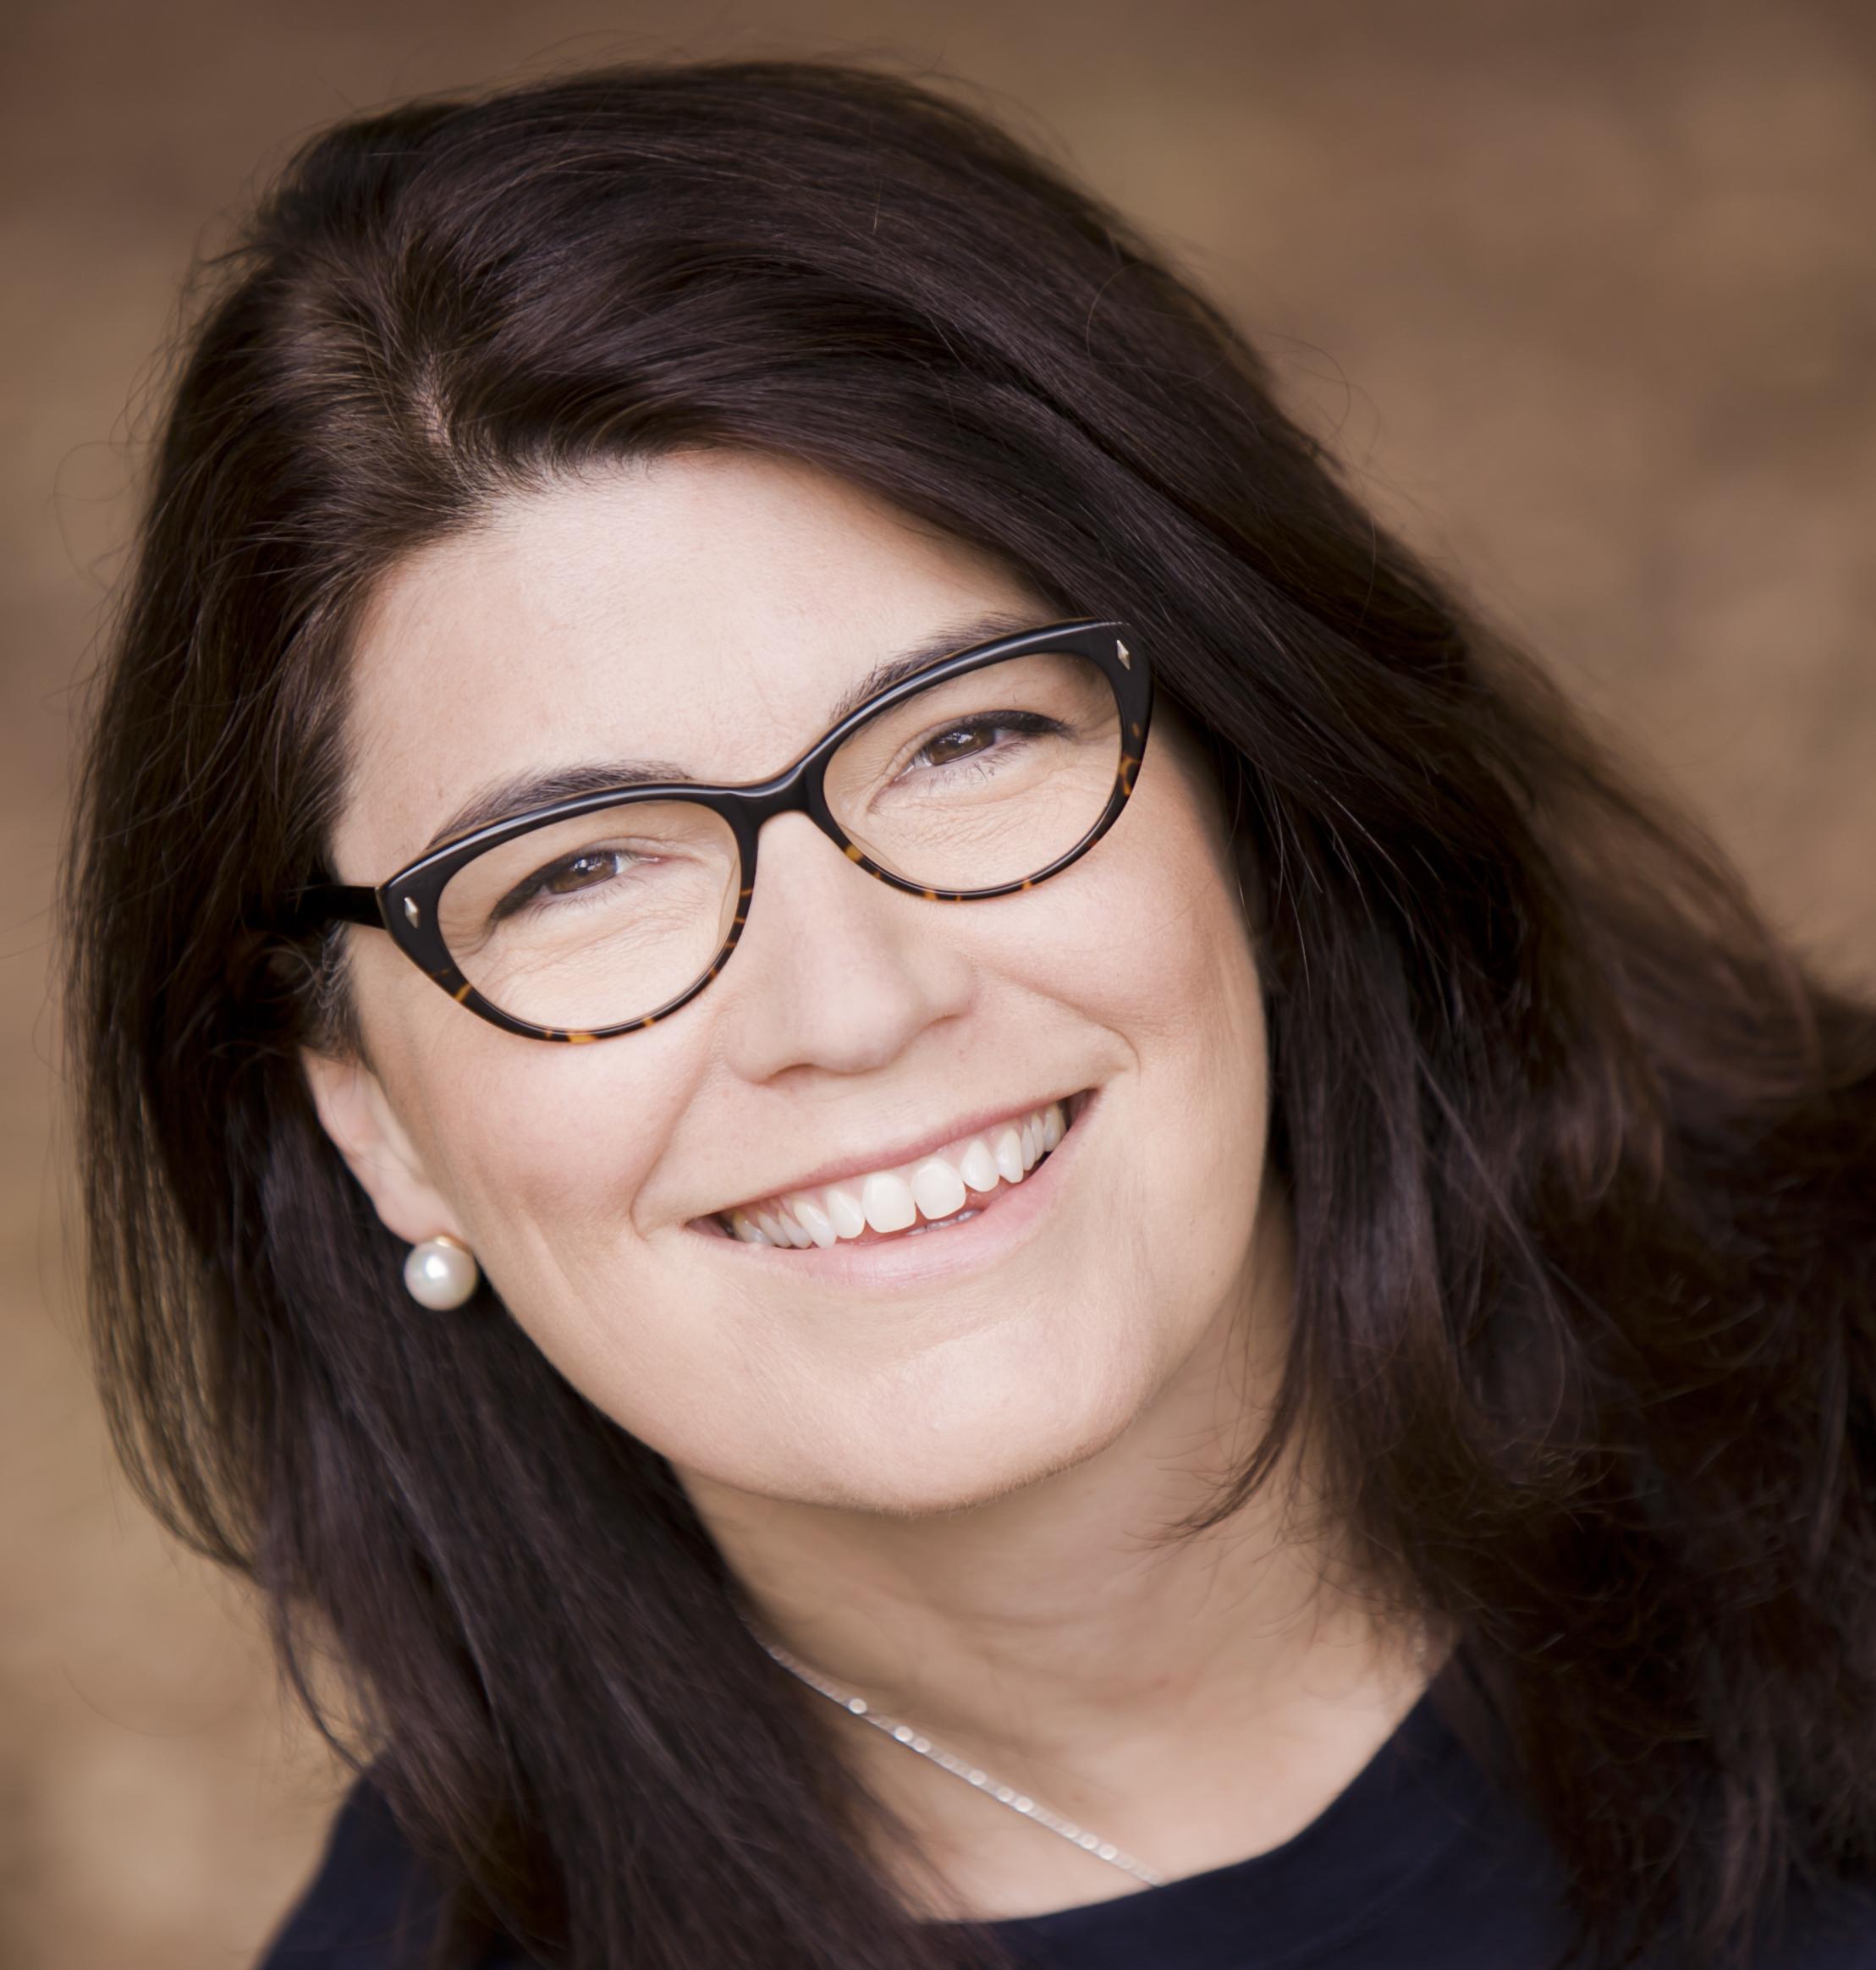 Katie Ferrick